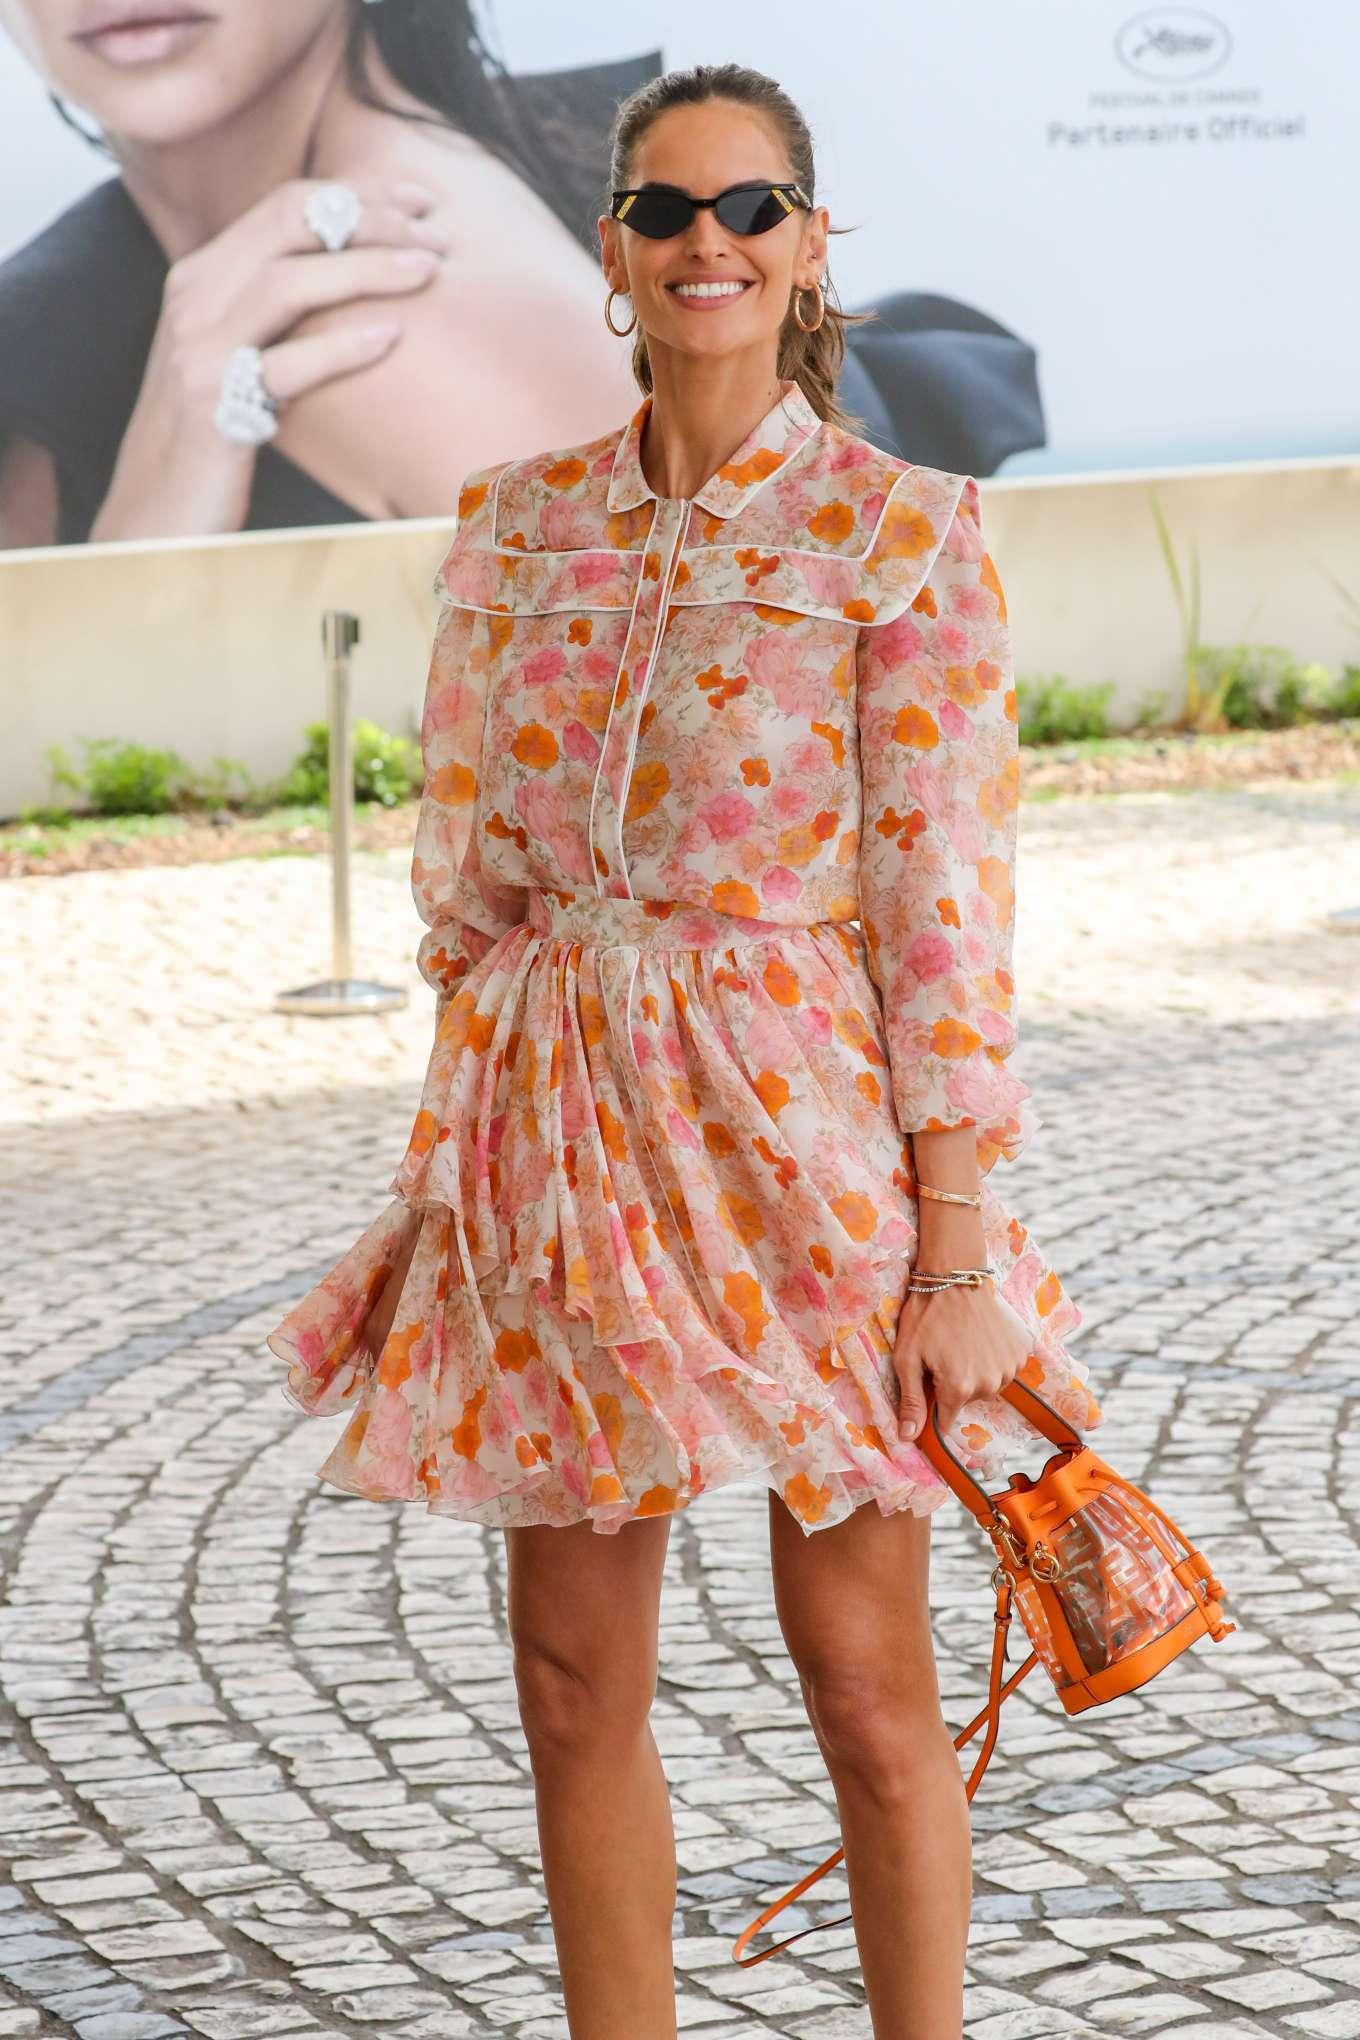 Izabel Goulart 2019 : Izabel Goulart in Floral Print Dress at the Martinez Hotel-11